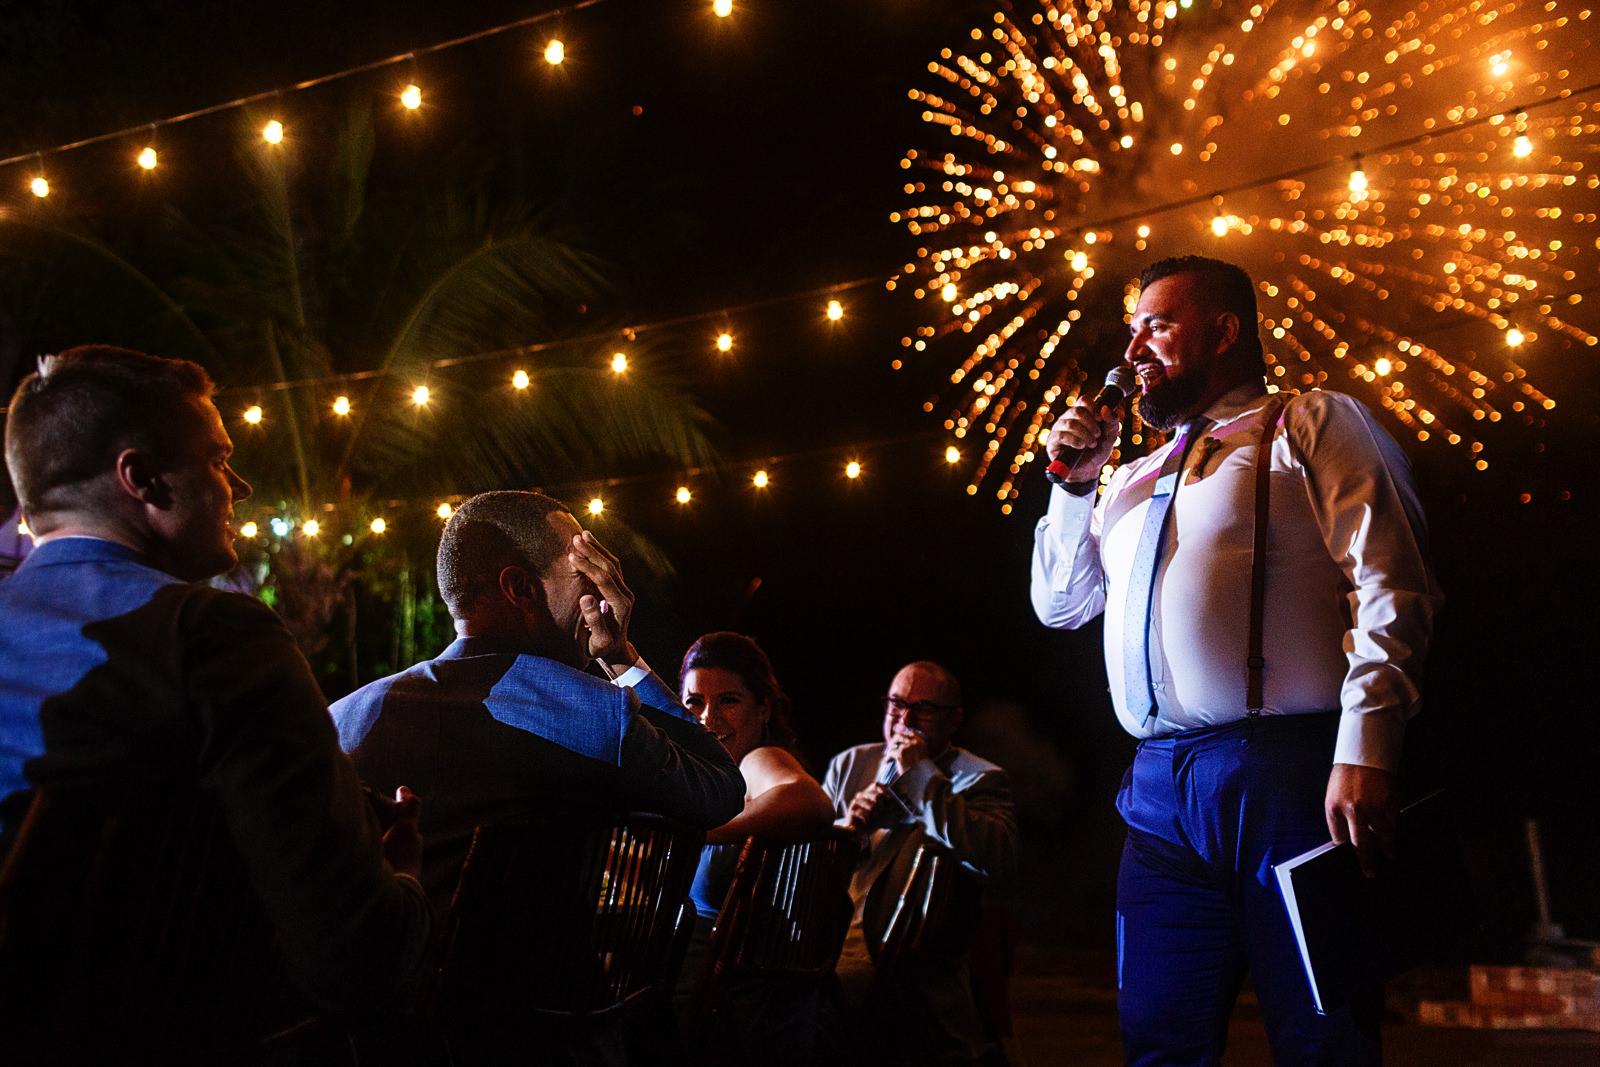 Next door wedding's fireworks start during bestman speech